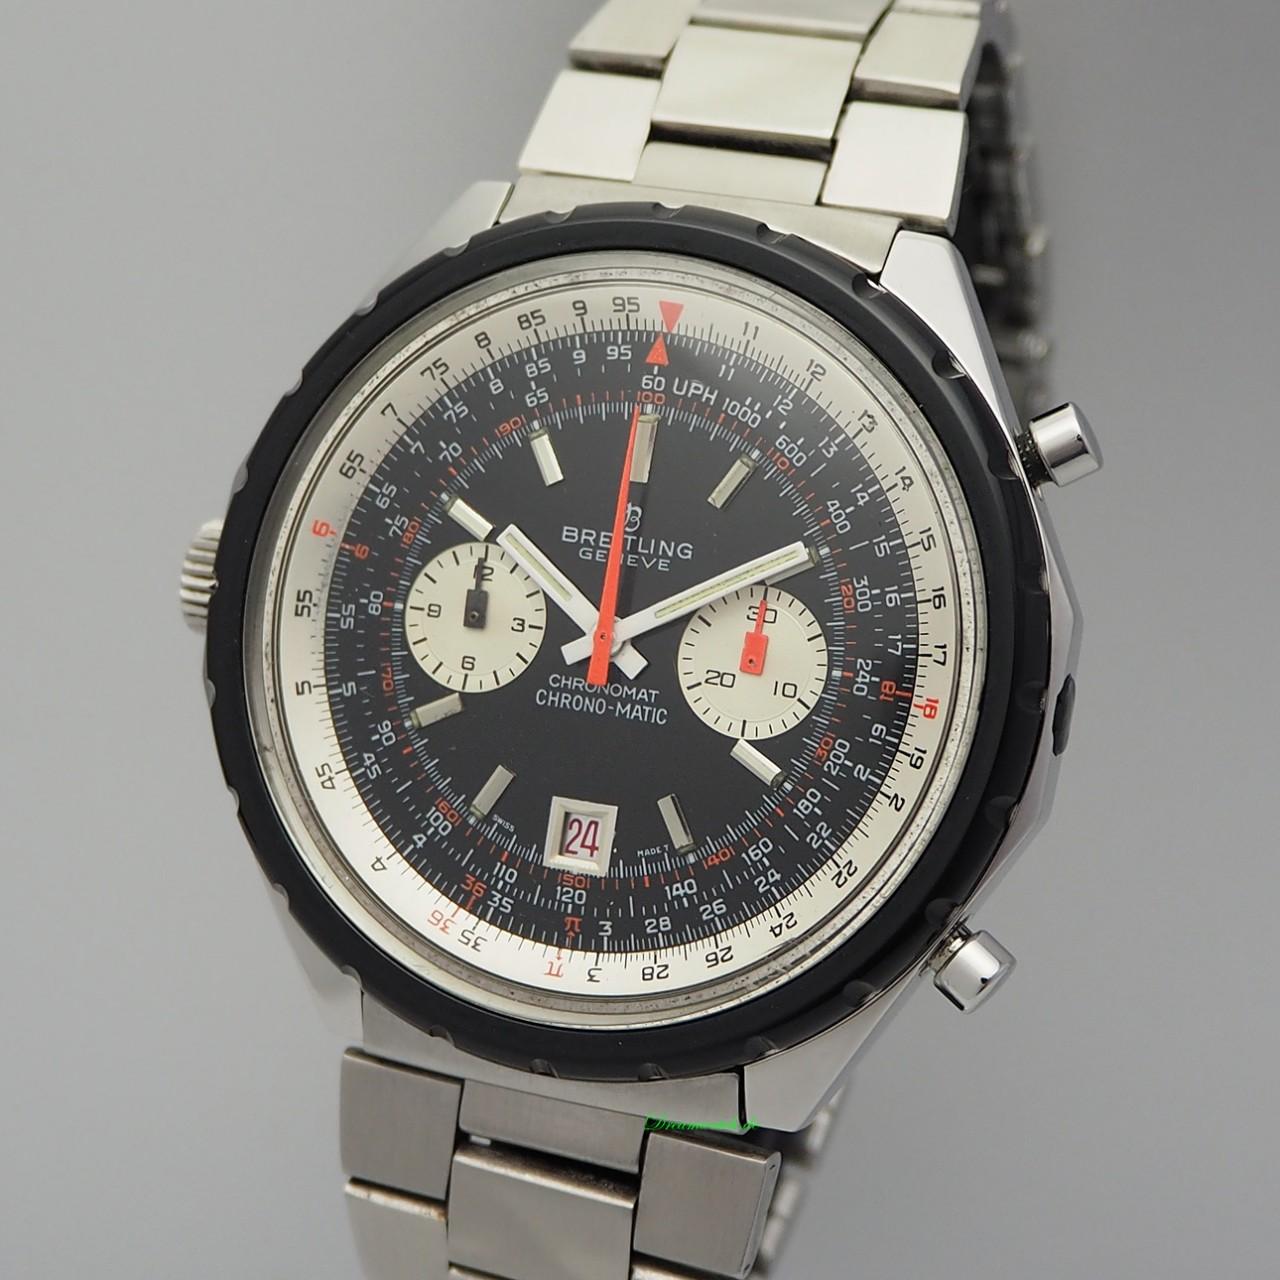 Breitling Chrono-Matic 1808 Vintage Chronograph Cal.12, Stahl/ Stahl